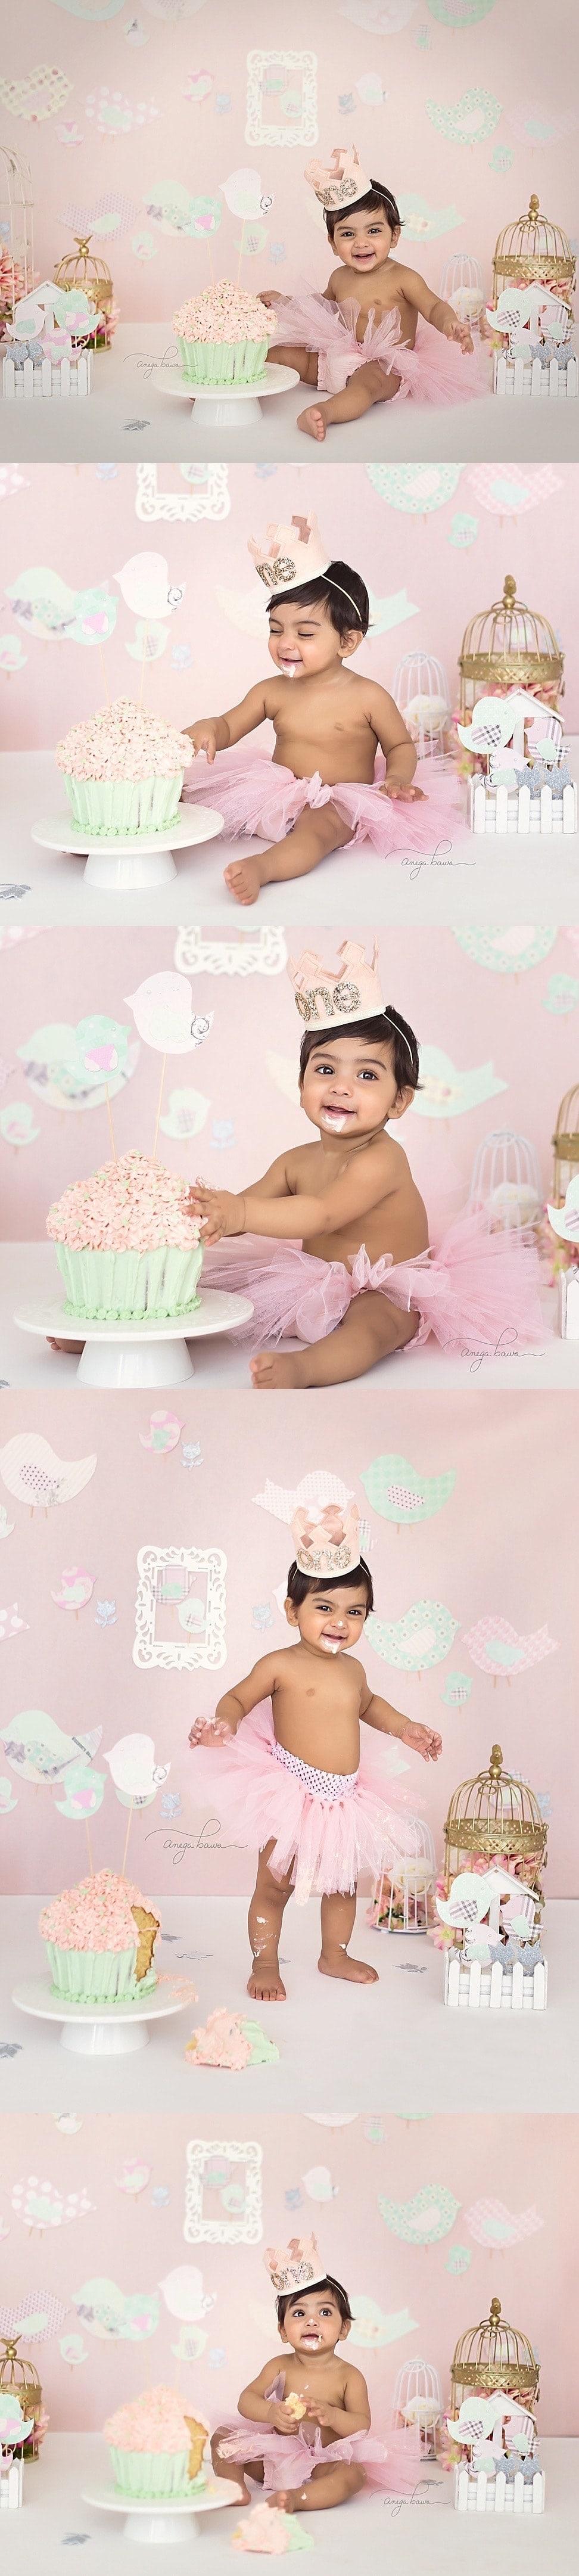 sitter_session_11-months-girl-cake-smash_baby_child